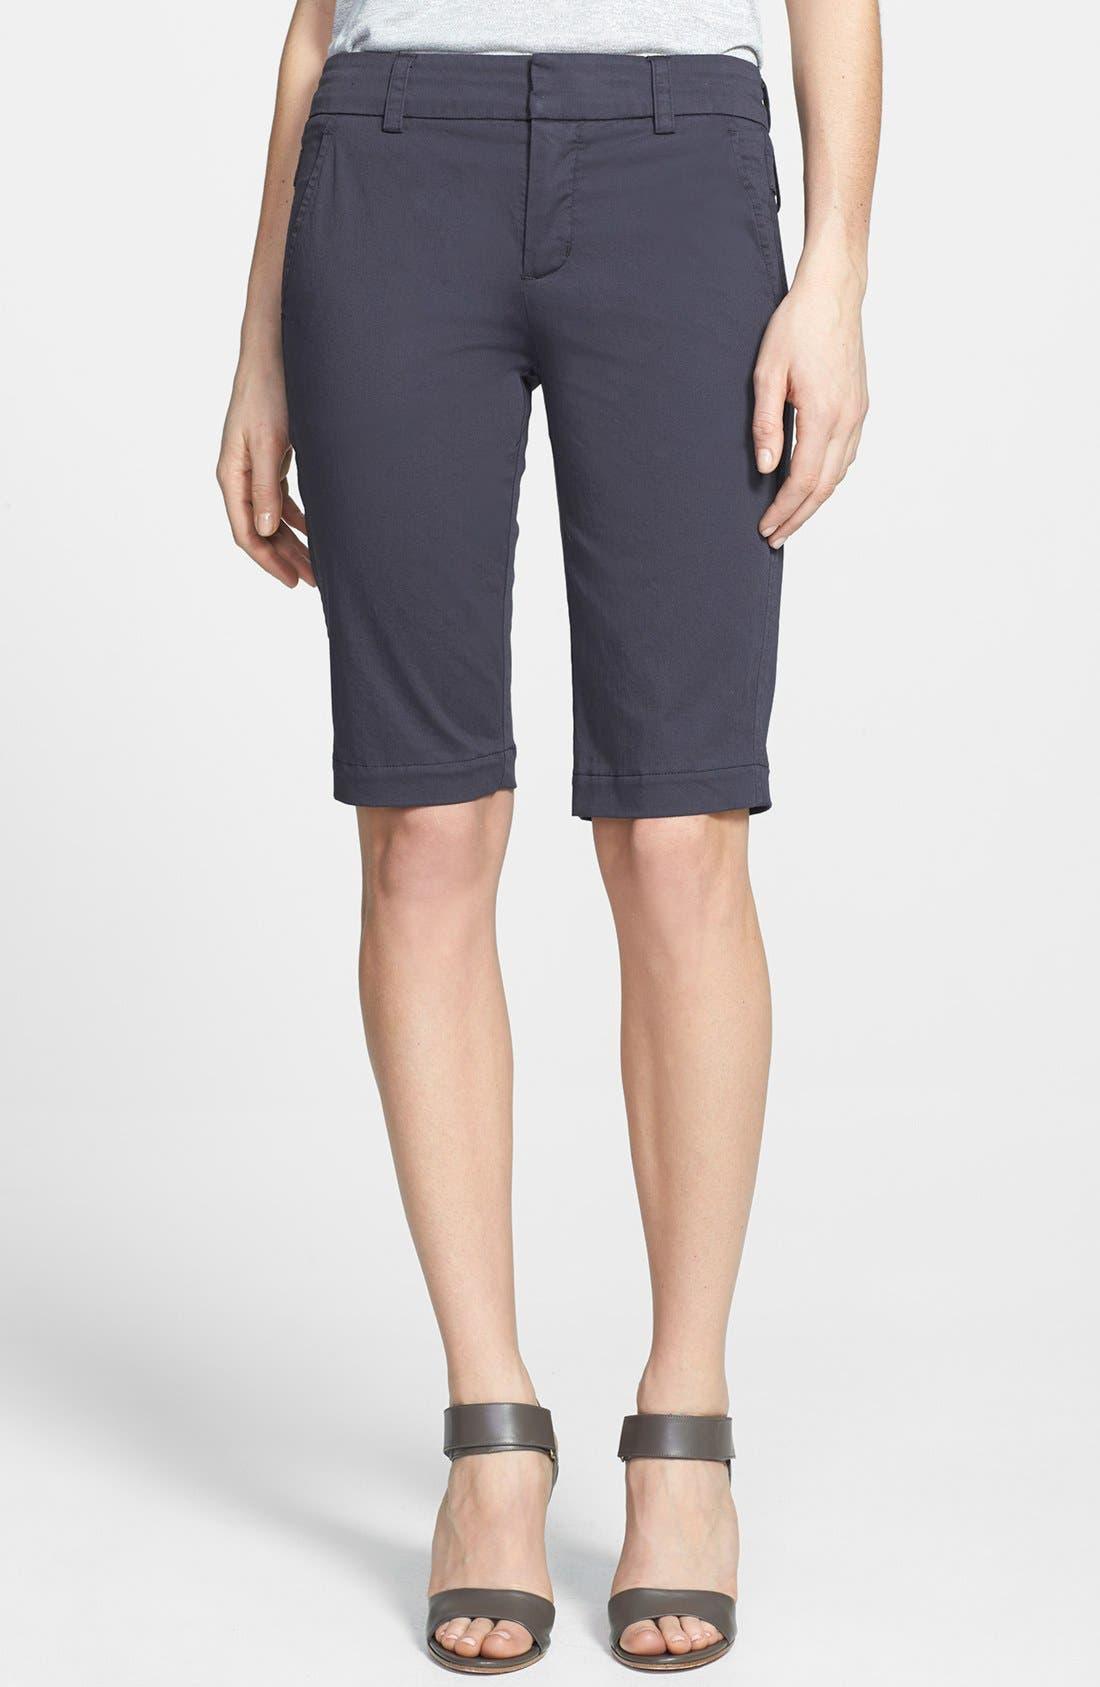 Alternate Image 1 Selected - Vince Side Buckle Bermuda Shorts